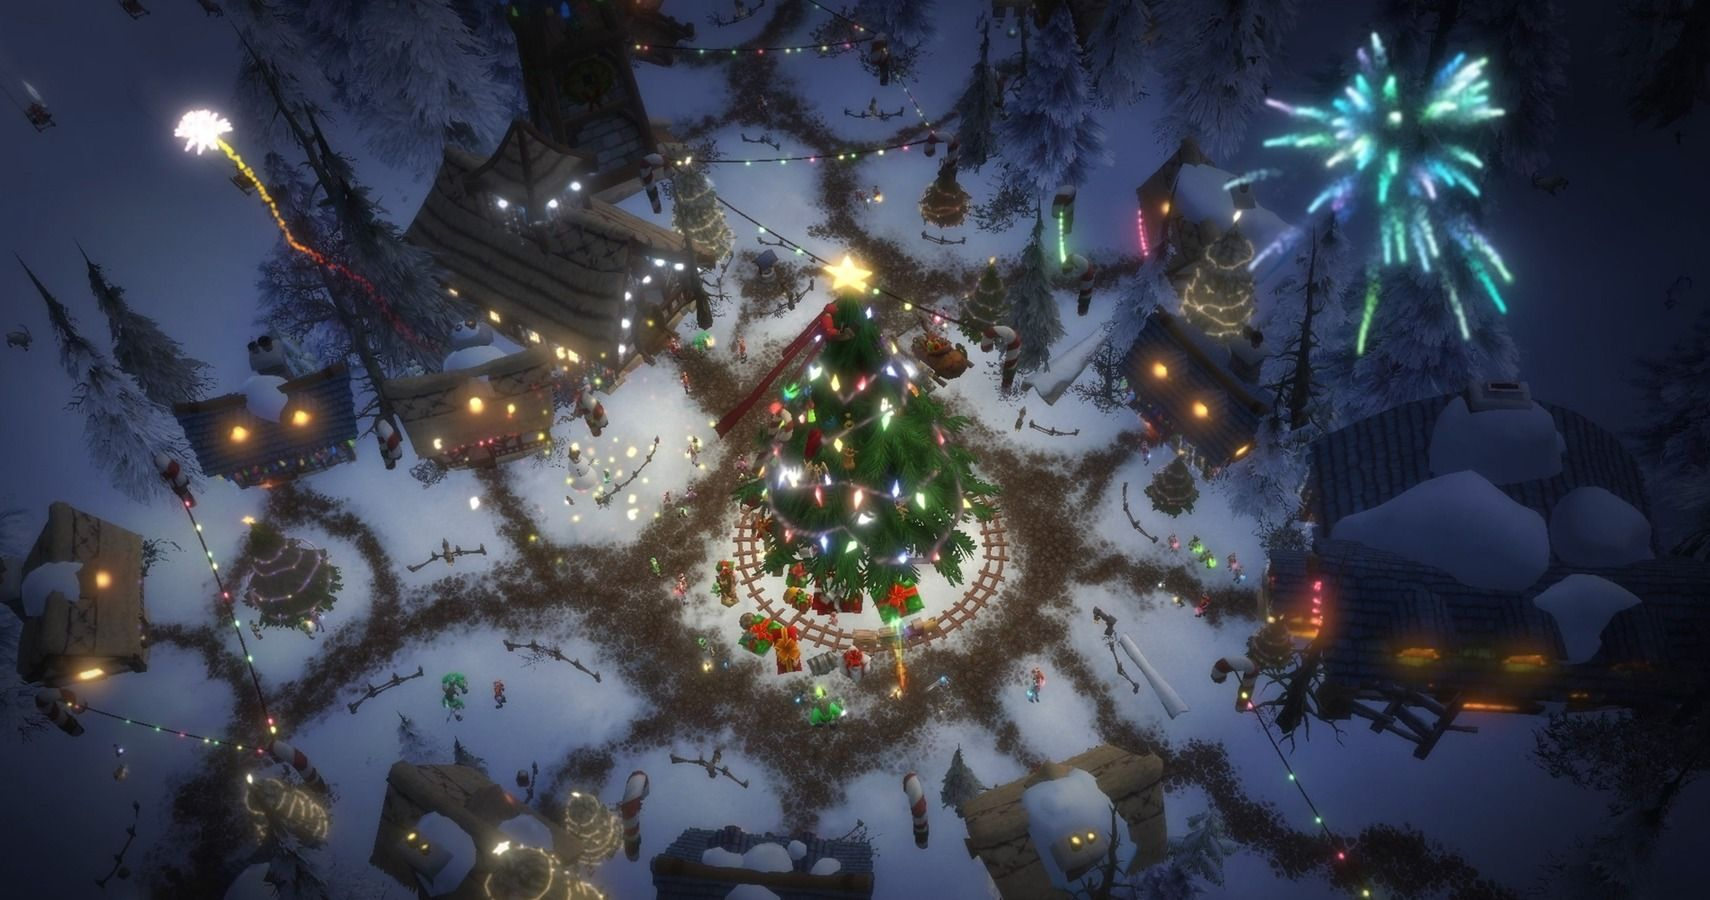 https://static1.thegamerimages.com/wordpress/wp-content/uploads/2019/11/feast-of-winter-veil_title-image.jpg